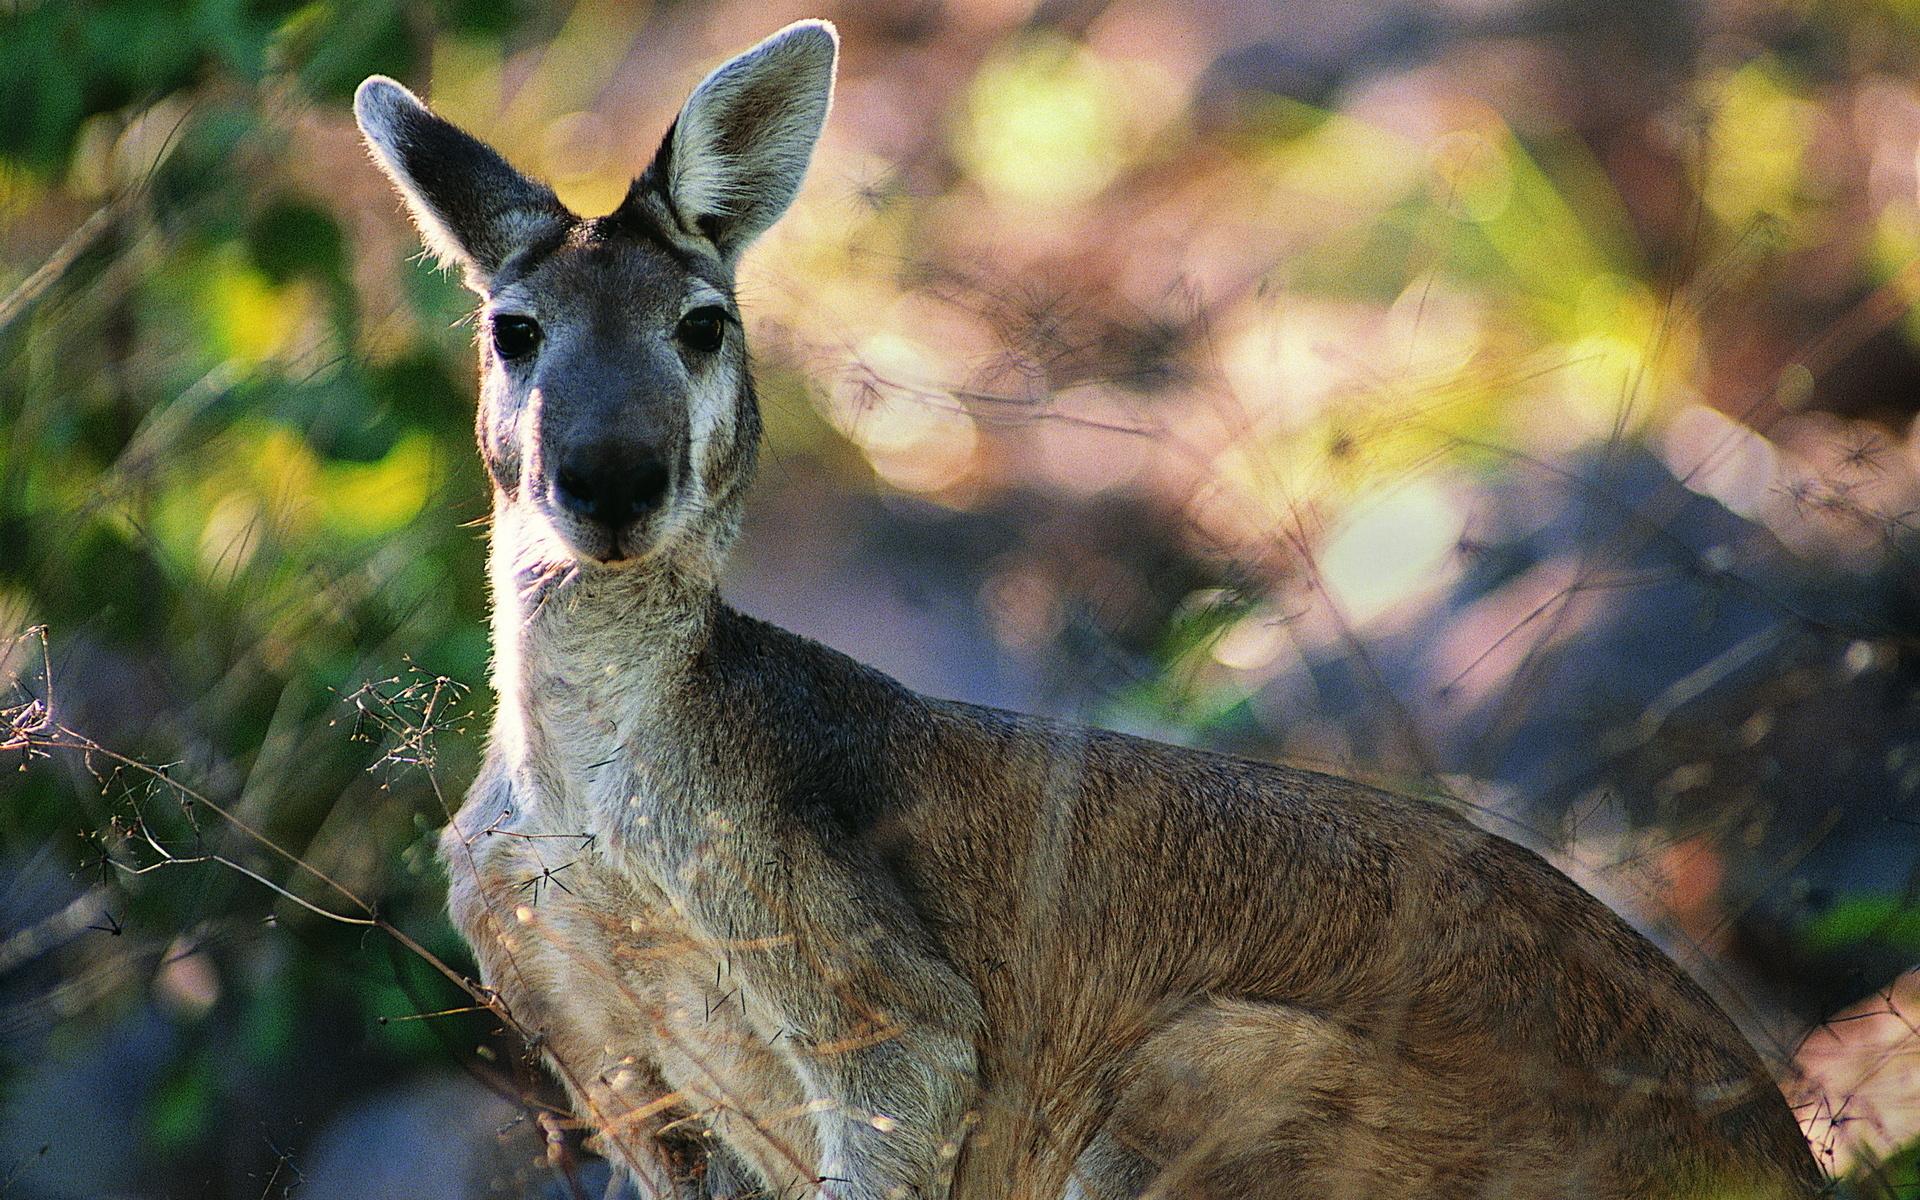 Free Download Cute Flowers Wallpapers Kangaroo Nature Hd Desktop Wallpapers 4k Hd